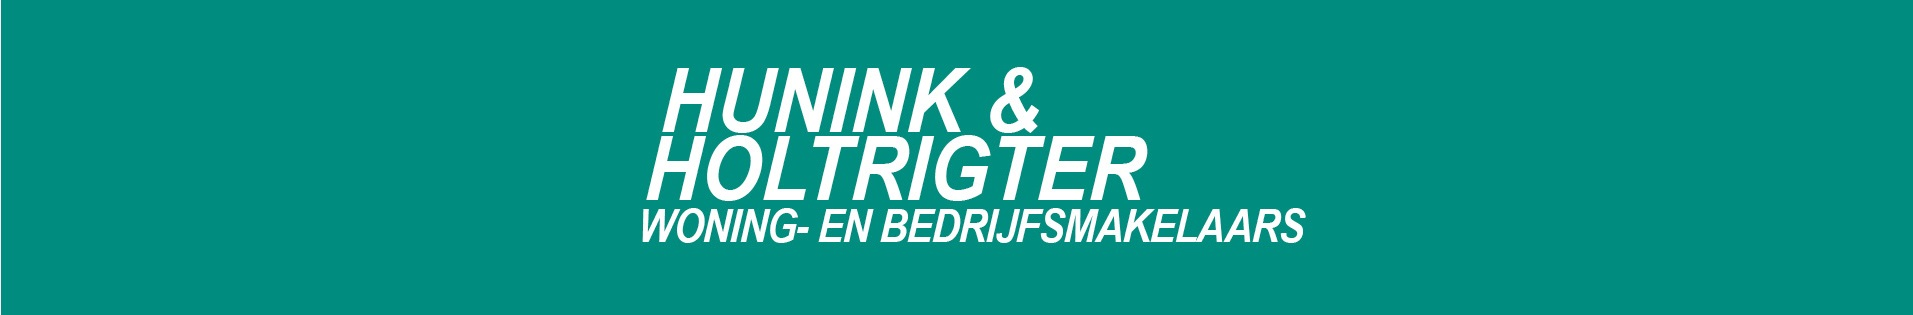 Logo Hunink & Holtrigter Woning- en Bedrijfsmakelaars